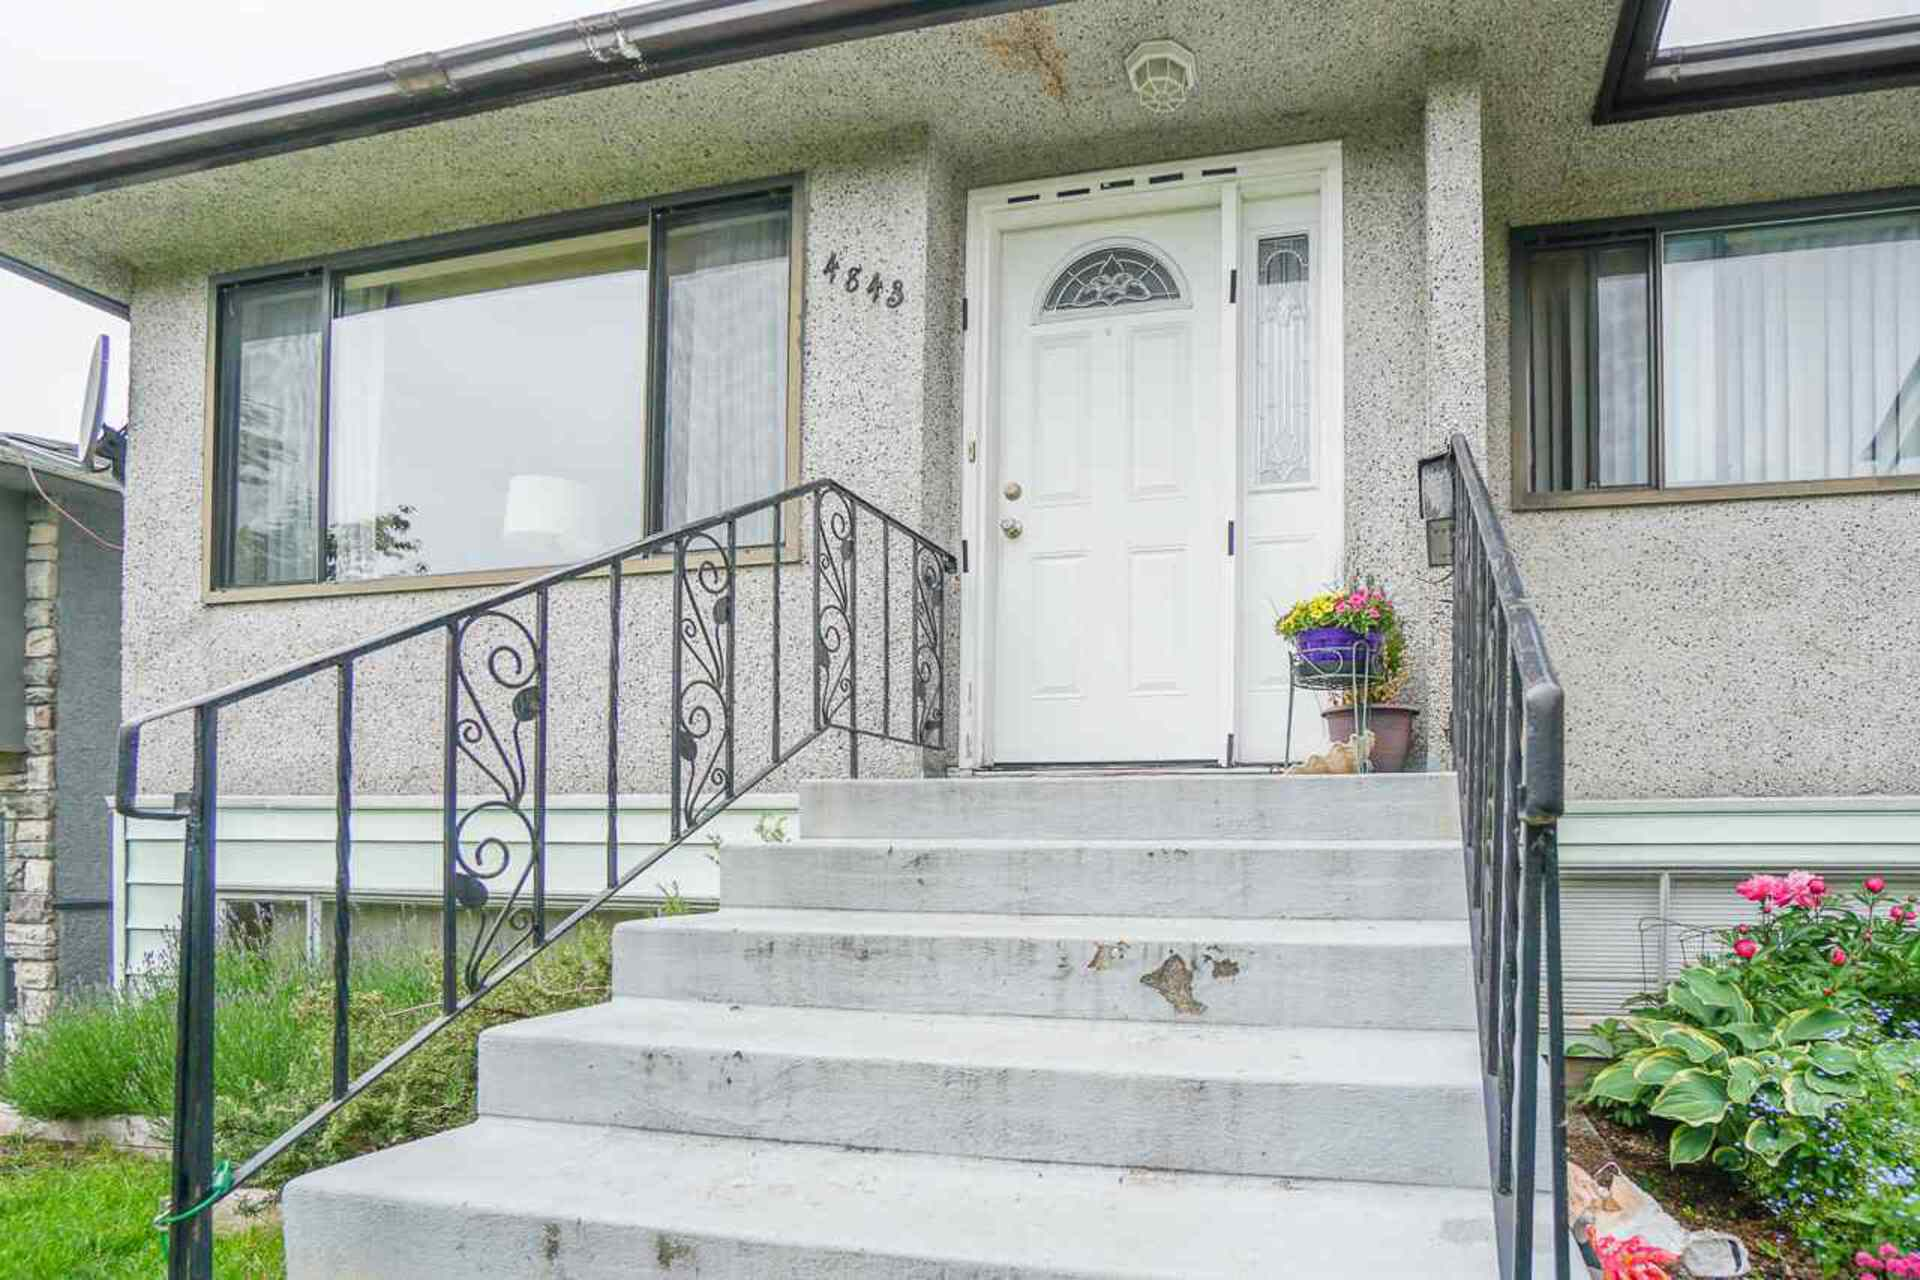 4843-payne-street-collingwood-ve-vancouver-east-38 of 4843 Payne Street, Collingwood VE, Vancouver East